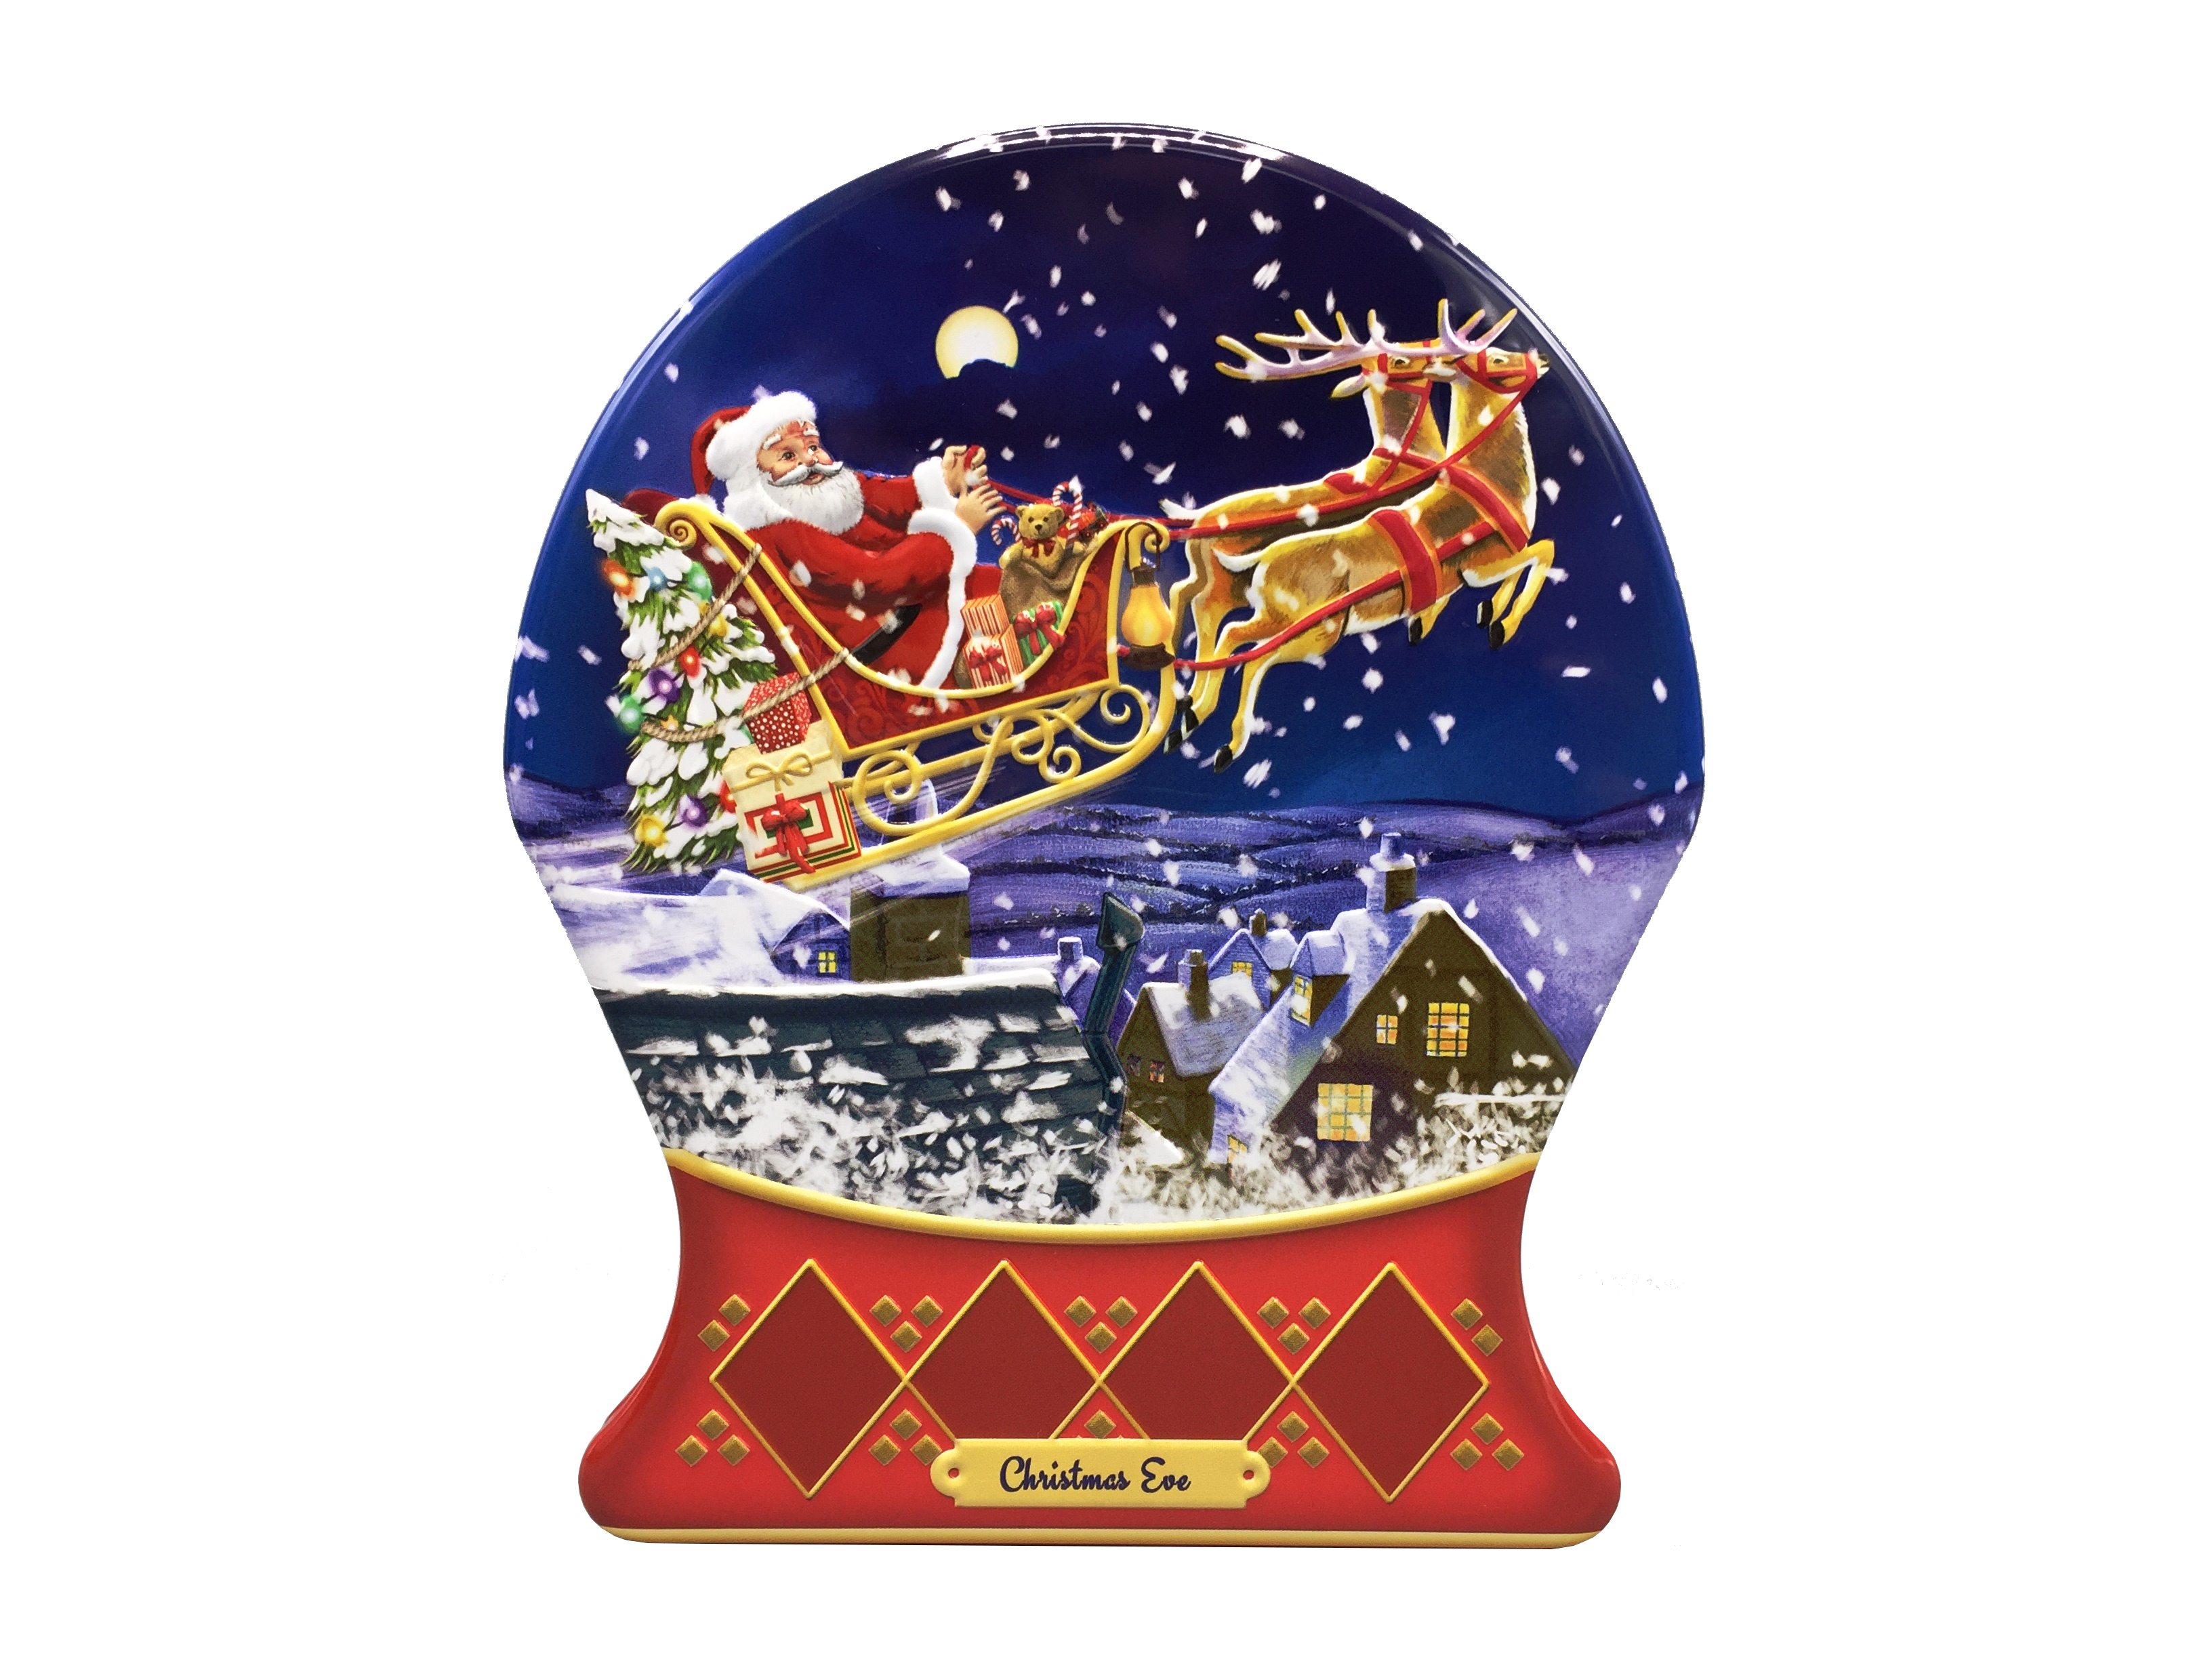 10441 Schneekugel Christmas Eve